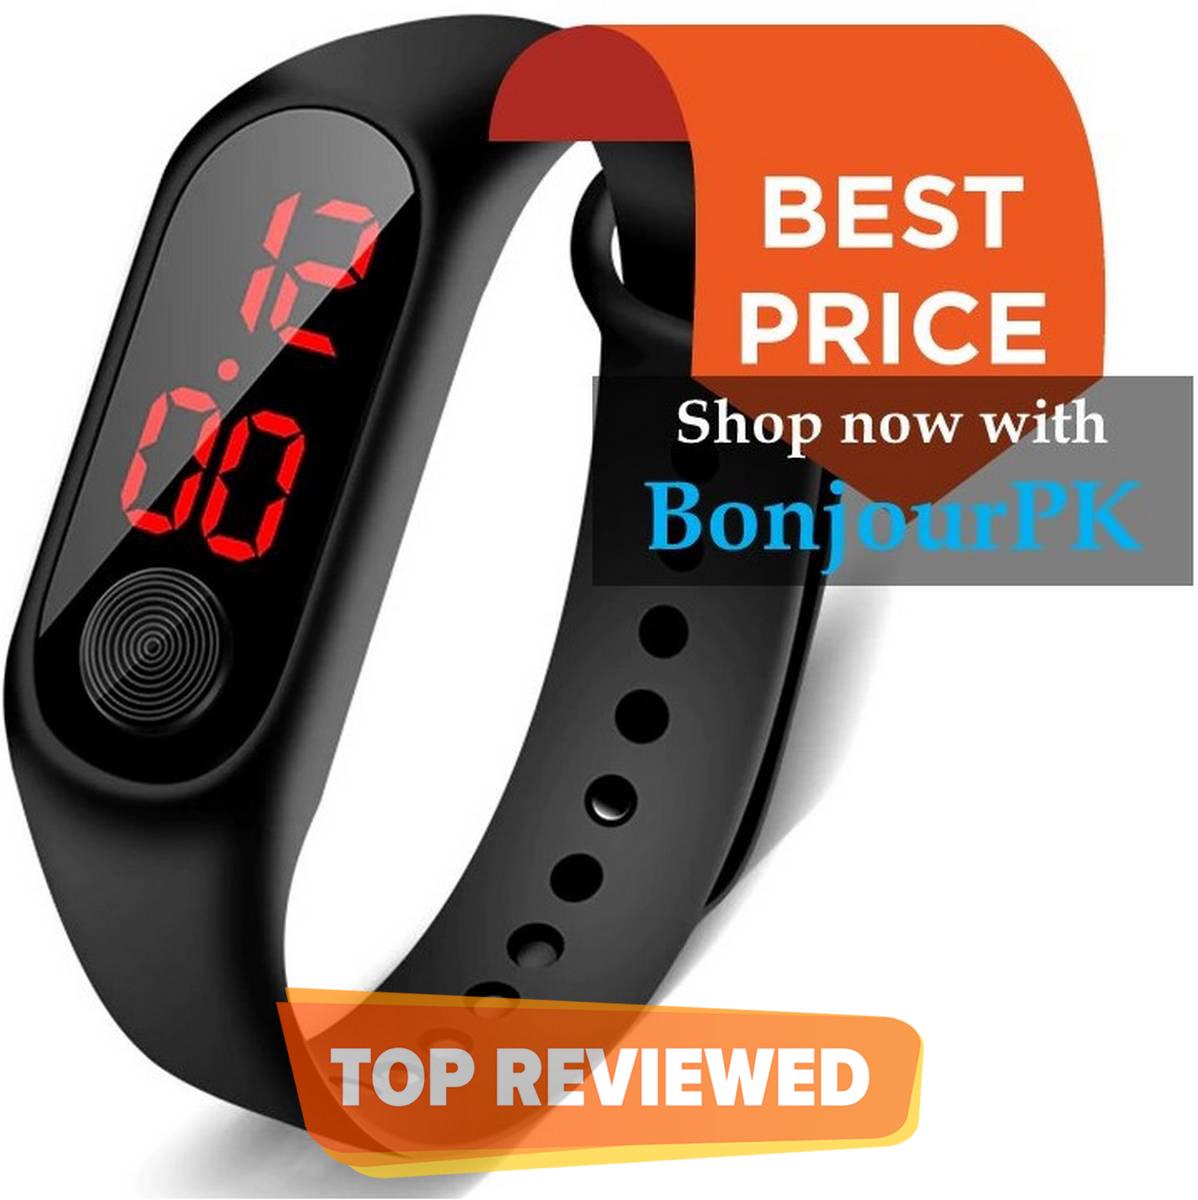 1 x Black Luxury Men Women Sport Casual M3 Led Bracelet Digital Watch Band  Fashion Watch Bracelet For Boys and Girls  Smart Bracelet Led Wrist Watch  Wristband Fitness watch